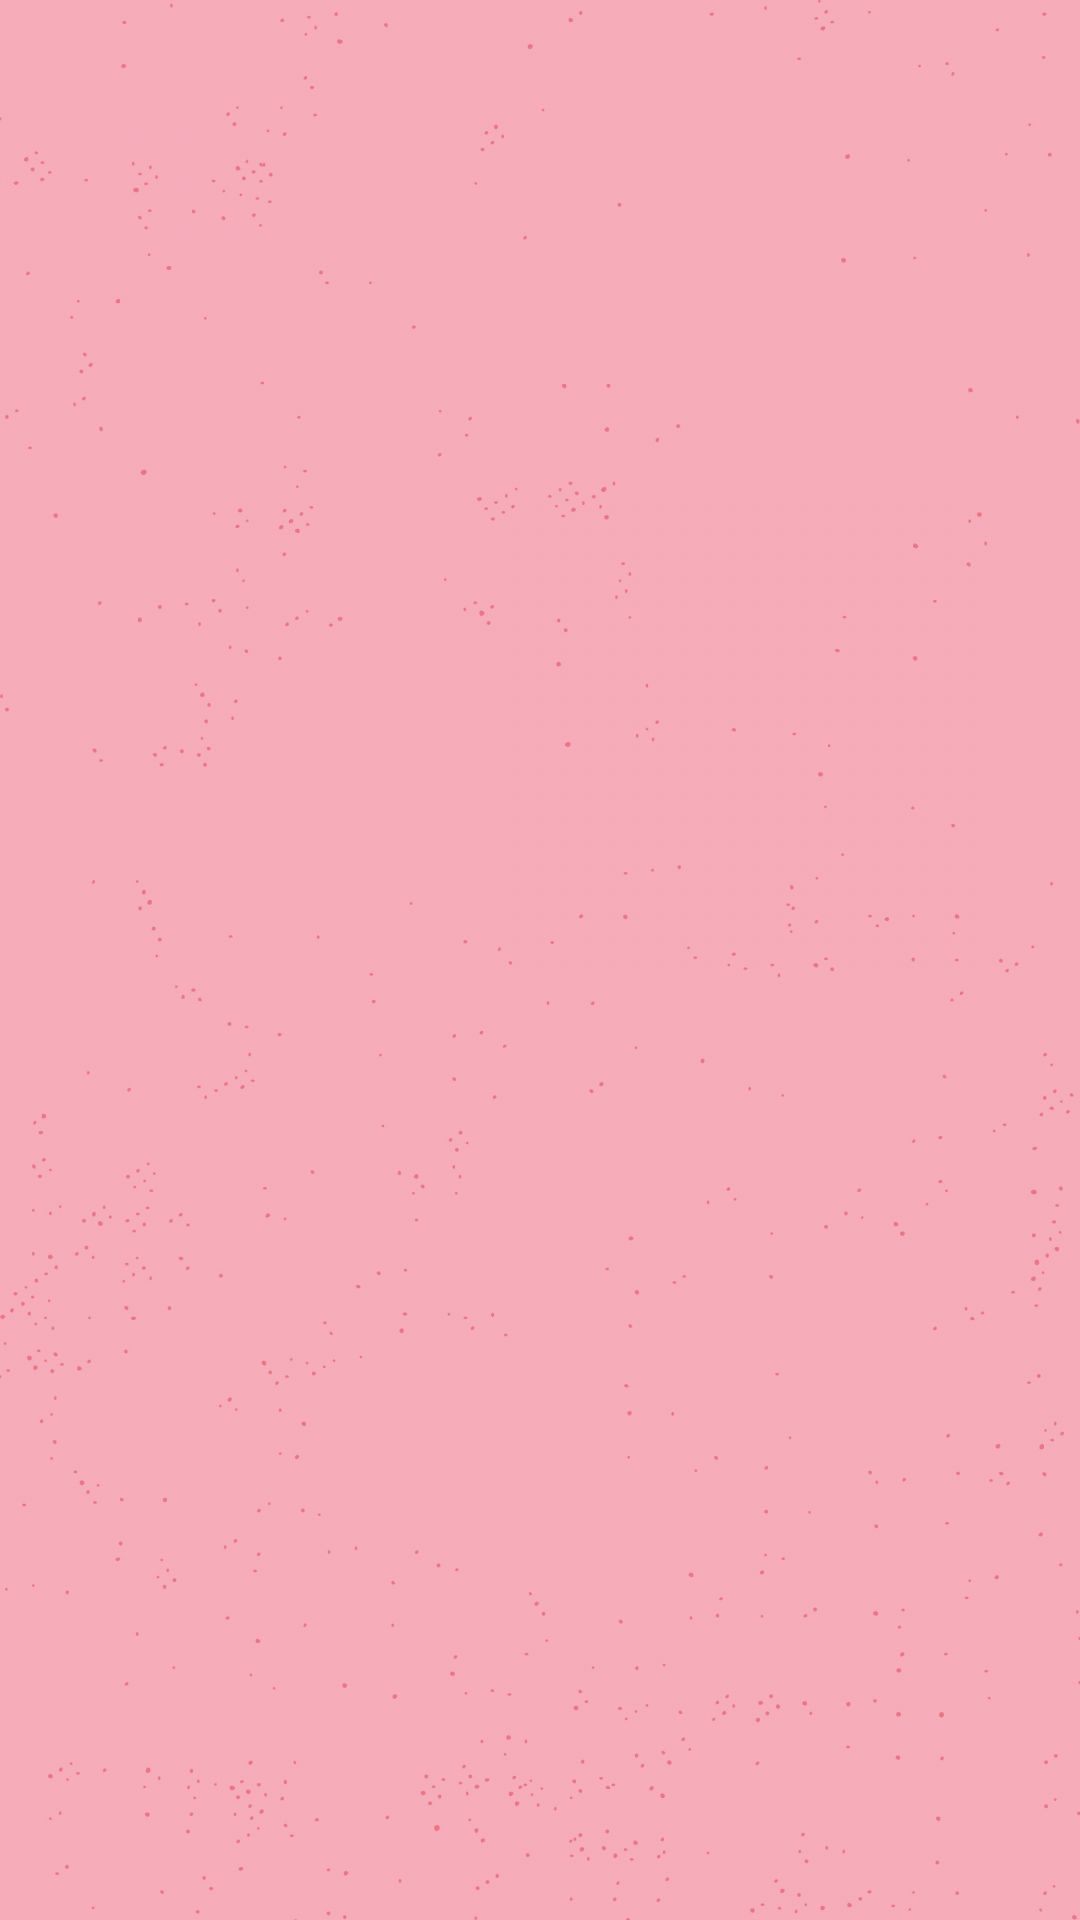 Pink And Grey Wallpaper Android Pink Wallpaper Iphone Color Wallpaper Iphone Pink And Grey Wallpaper